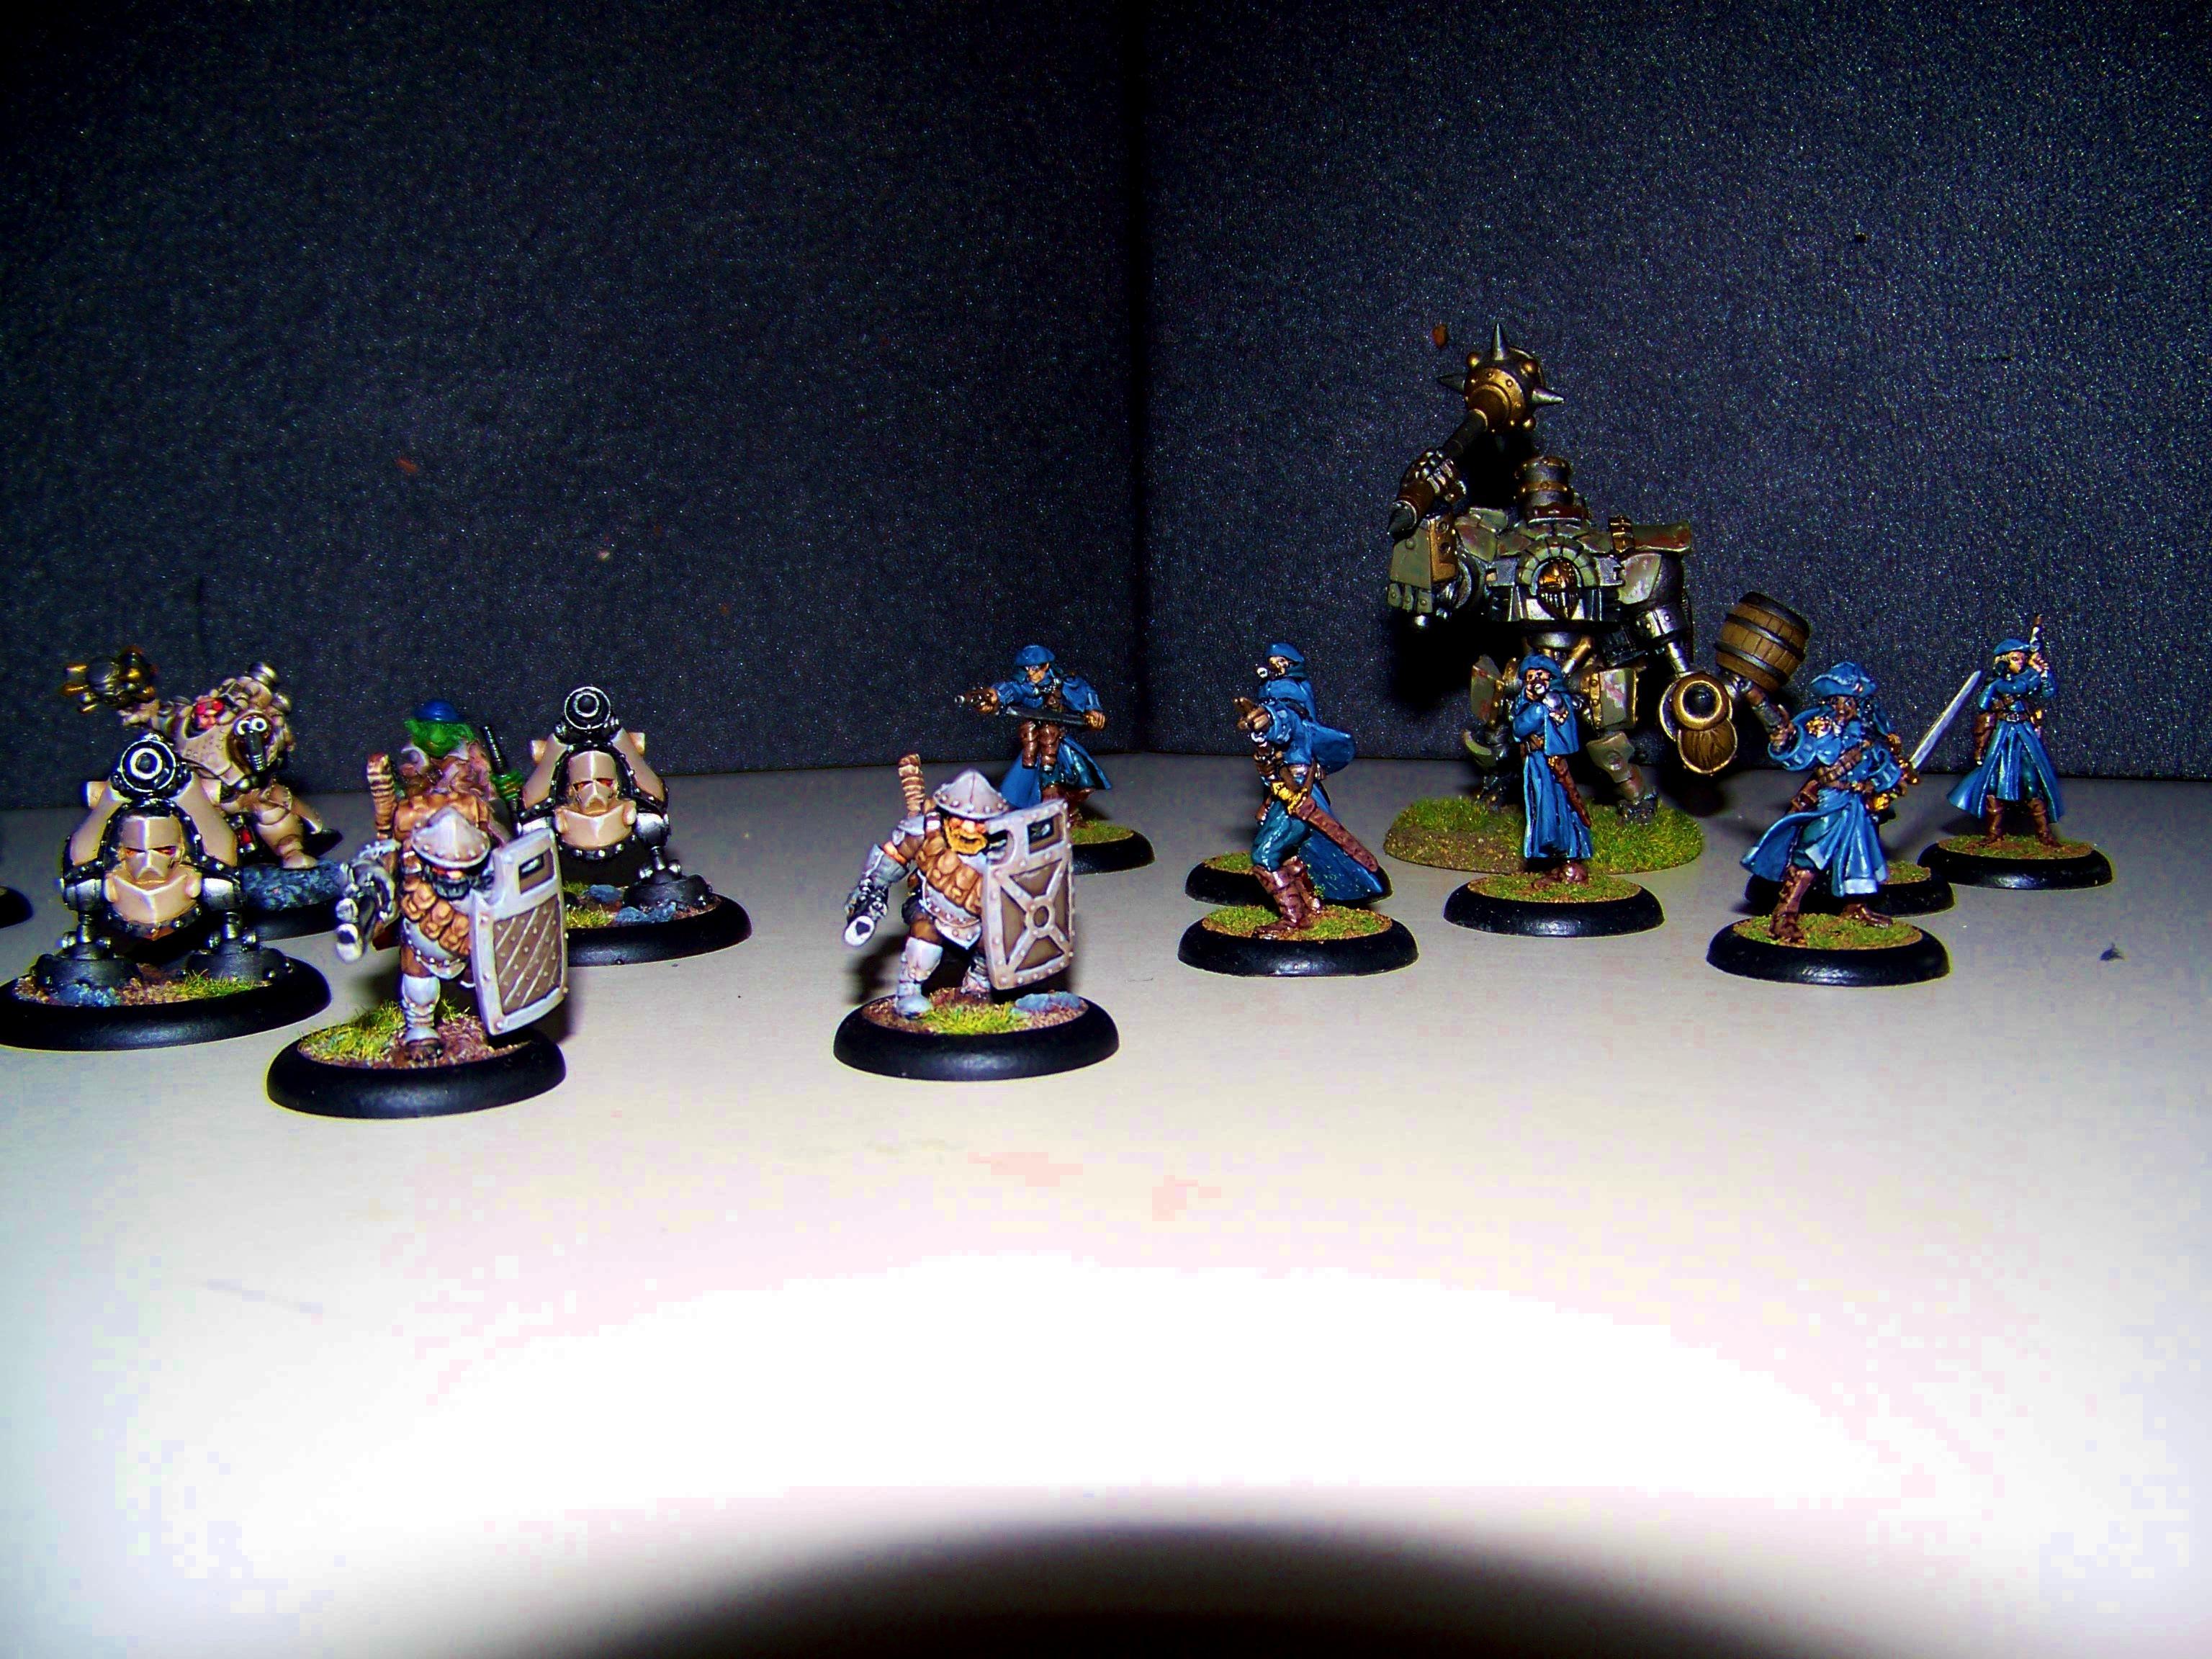 Mercenary, Rhulic, Searforge, Warmachine